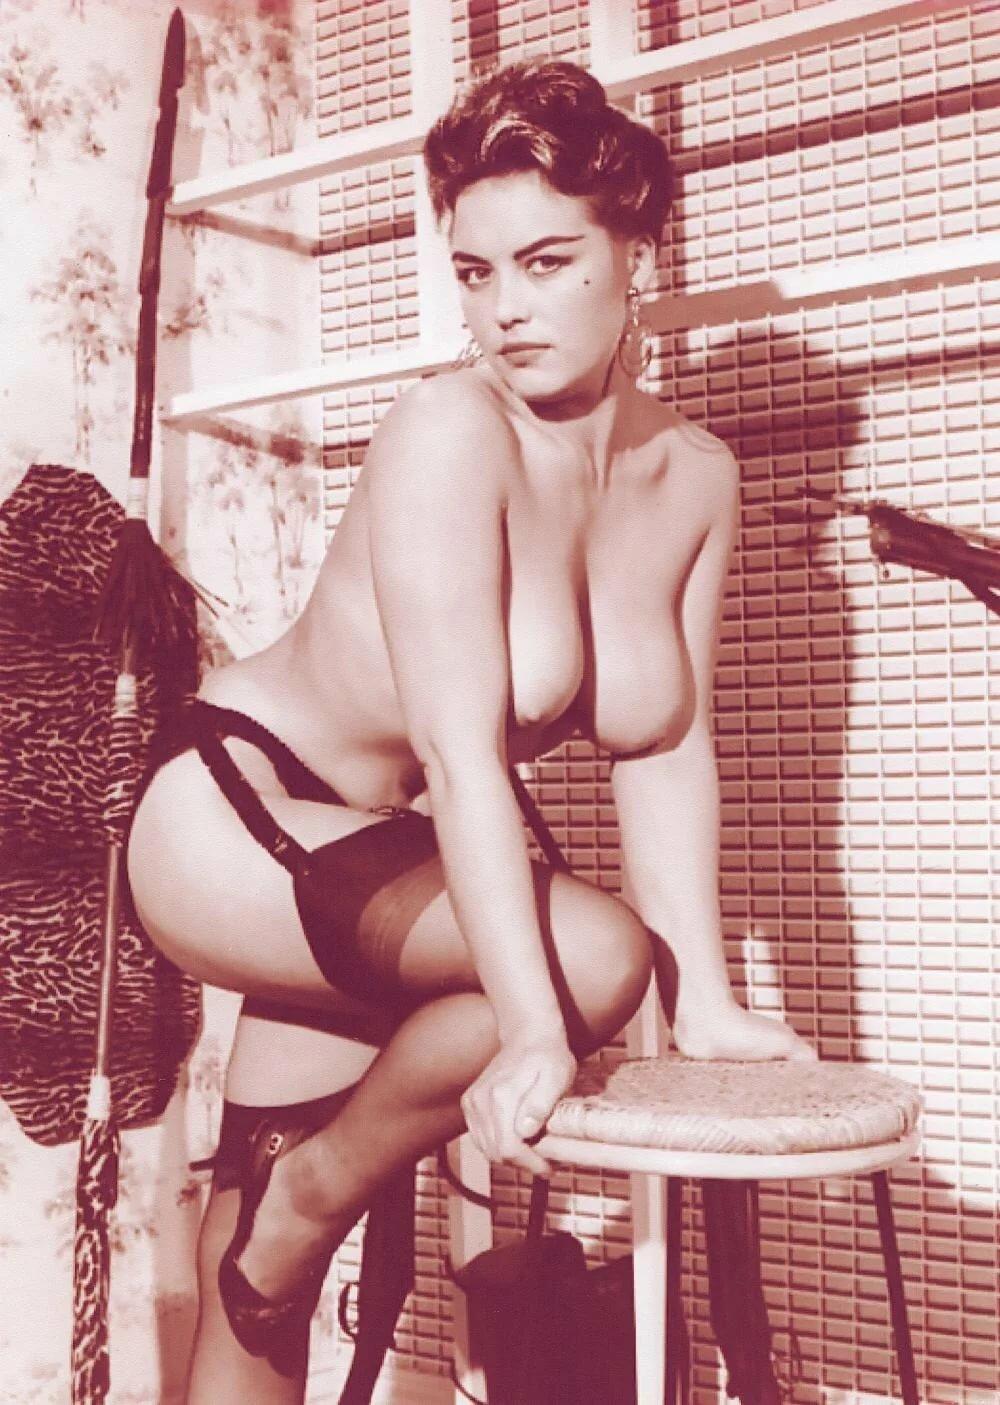 майклом ретро фото эротика брюнетки как могли обойтись